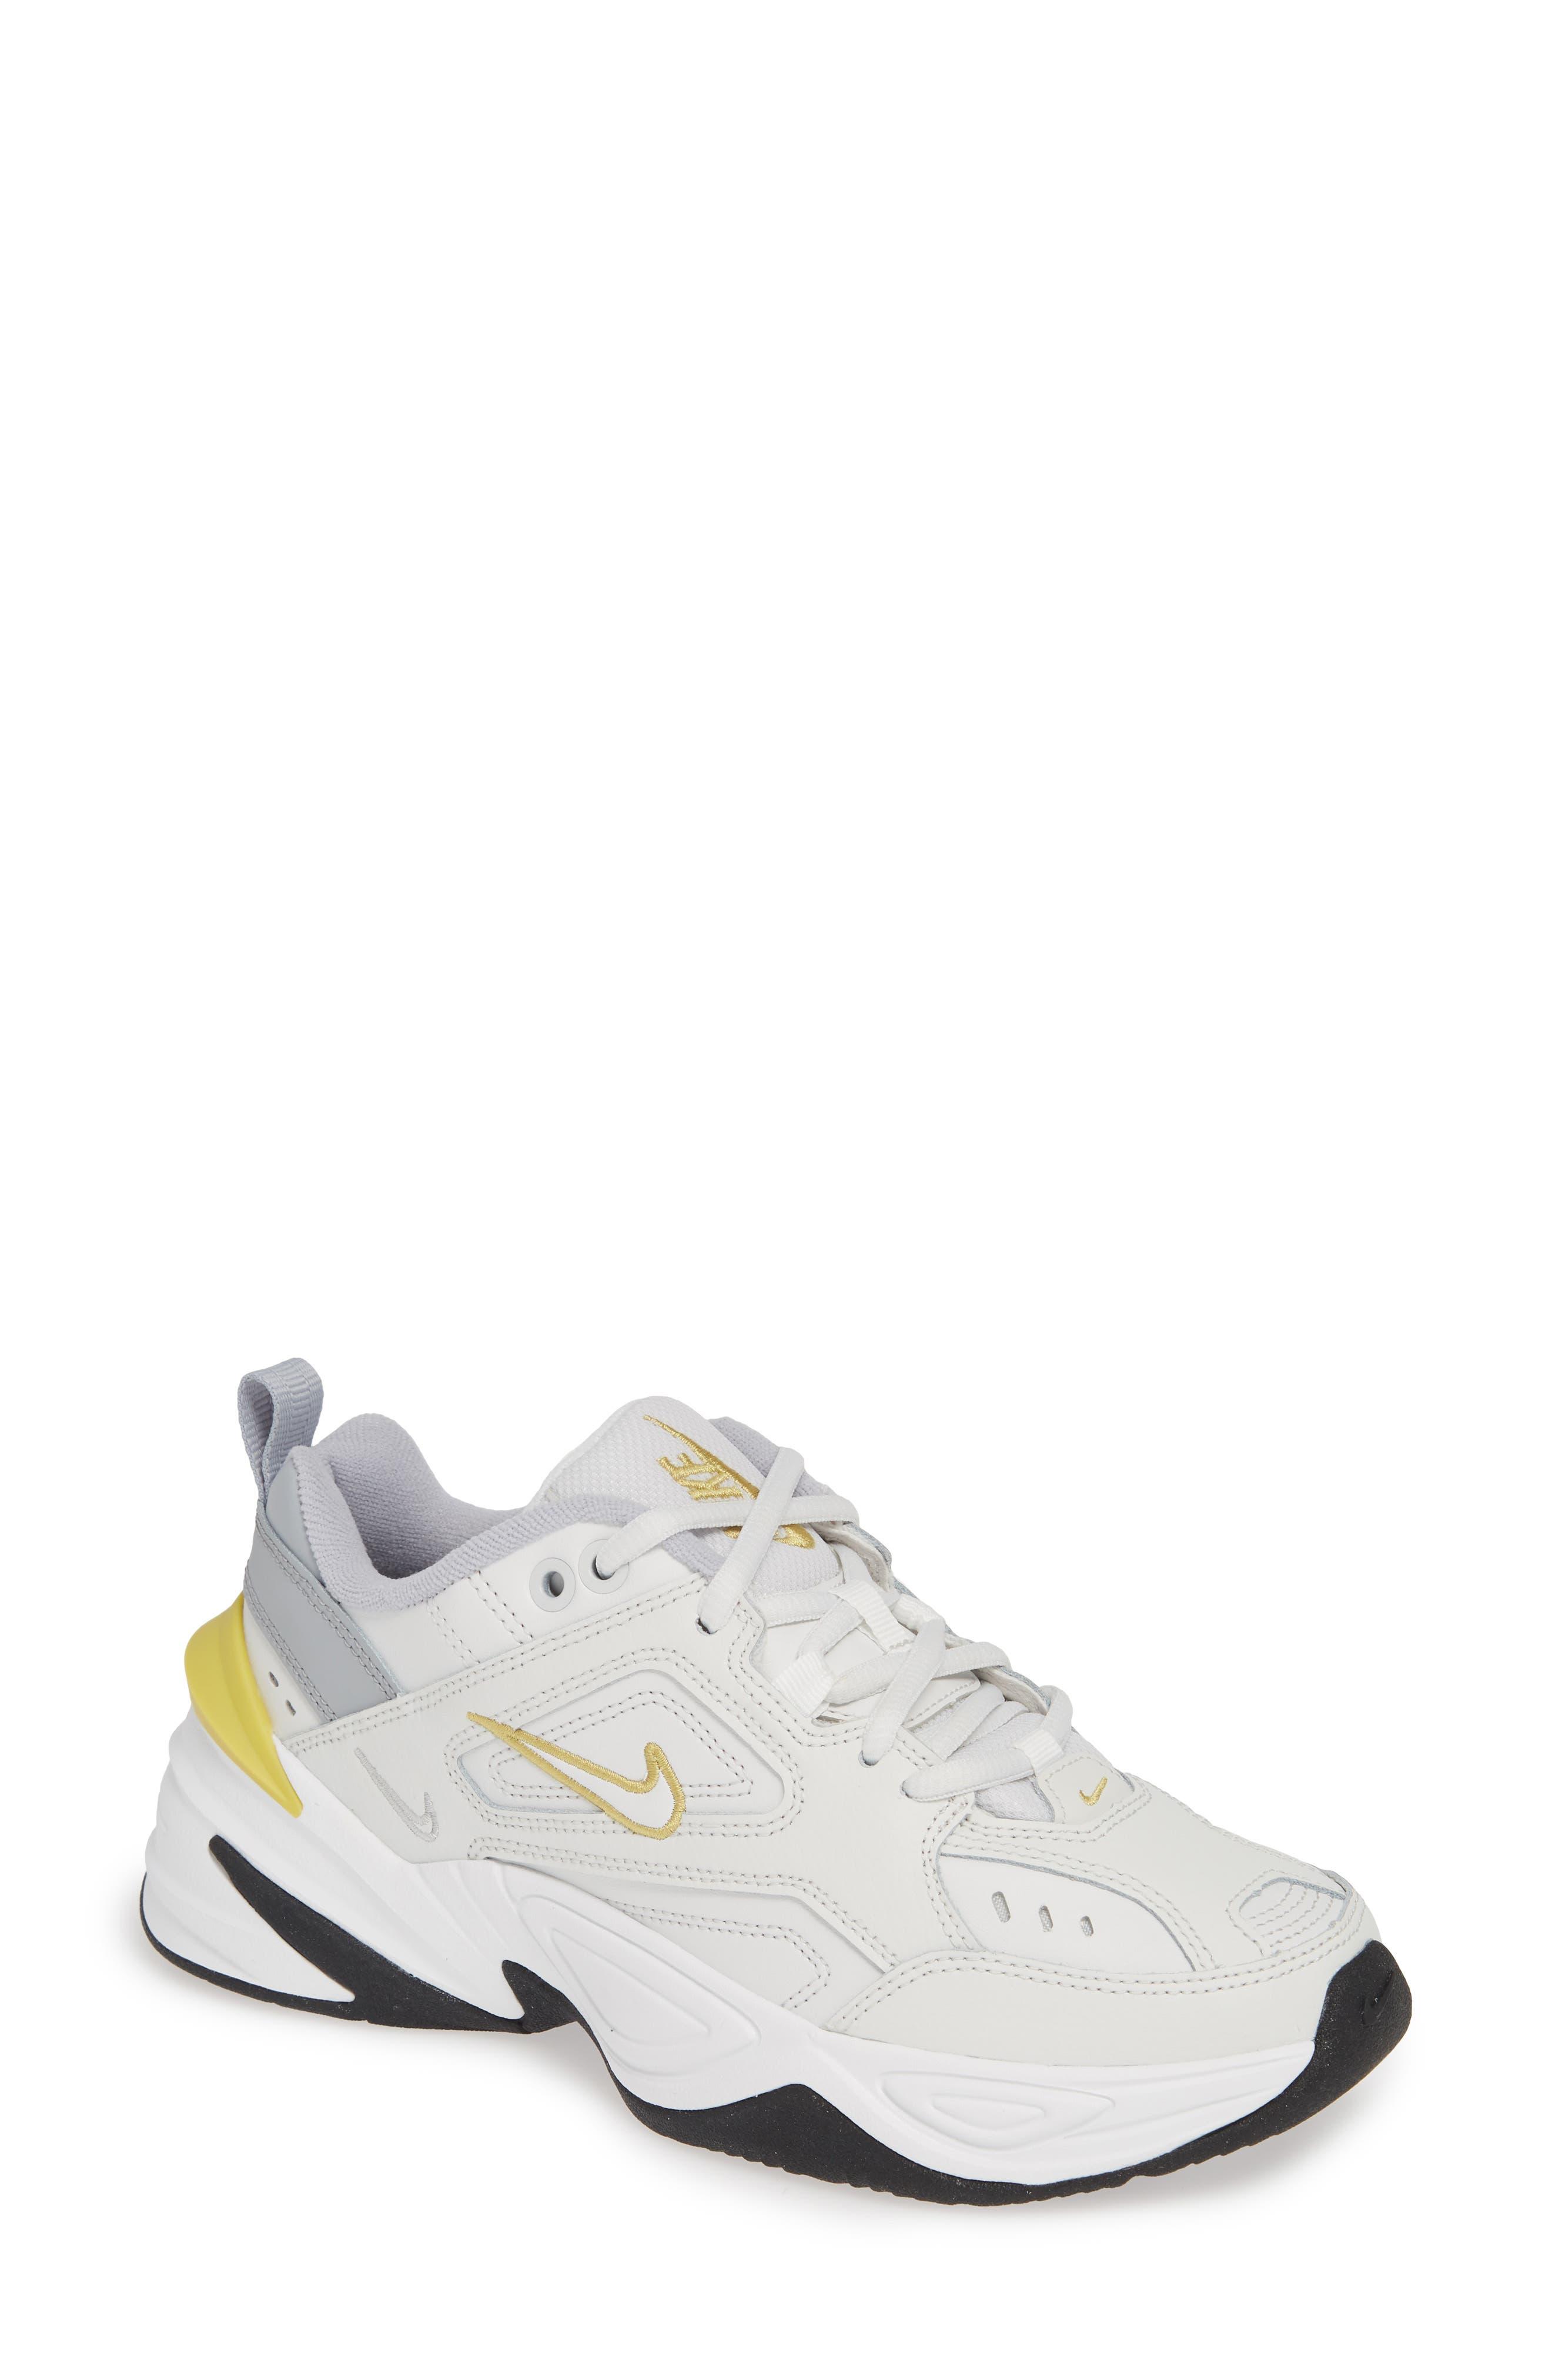 M2K Tekno Sneaker,                             Main thumbnail 1, color,                             PLATINUM TINT/ CELERY/ GREY